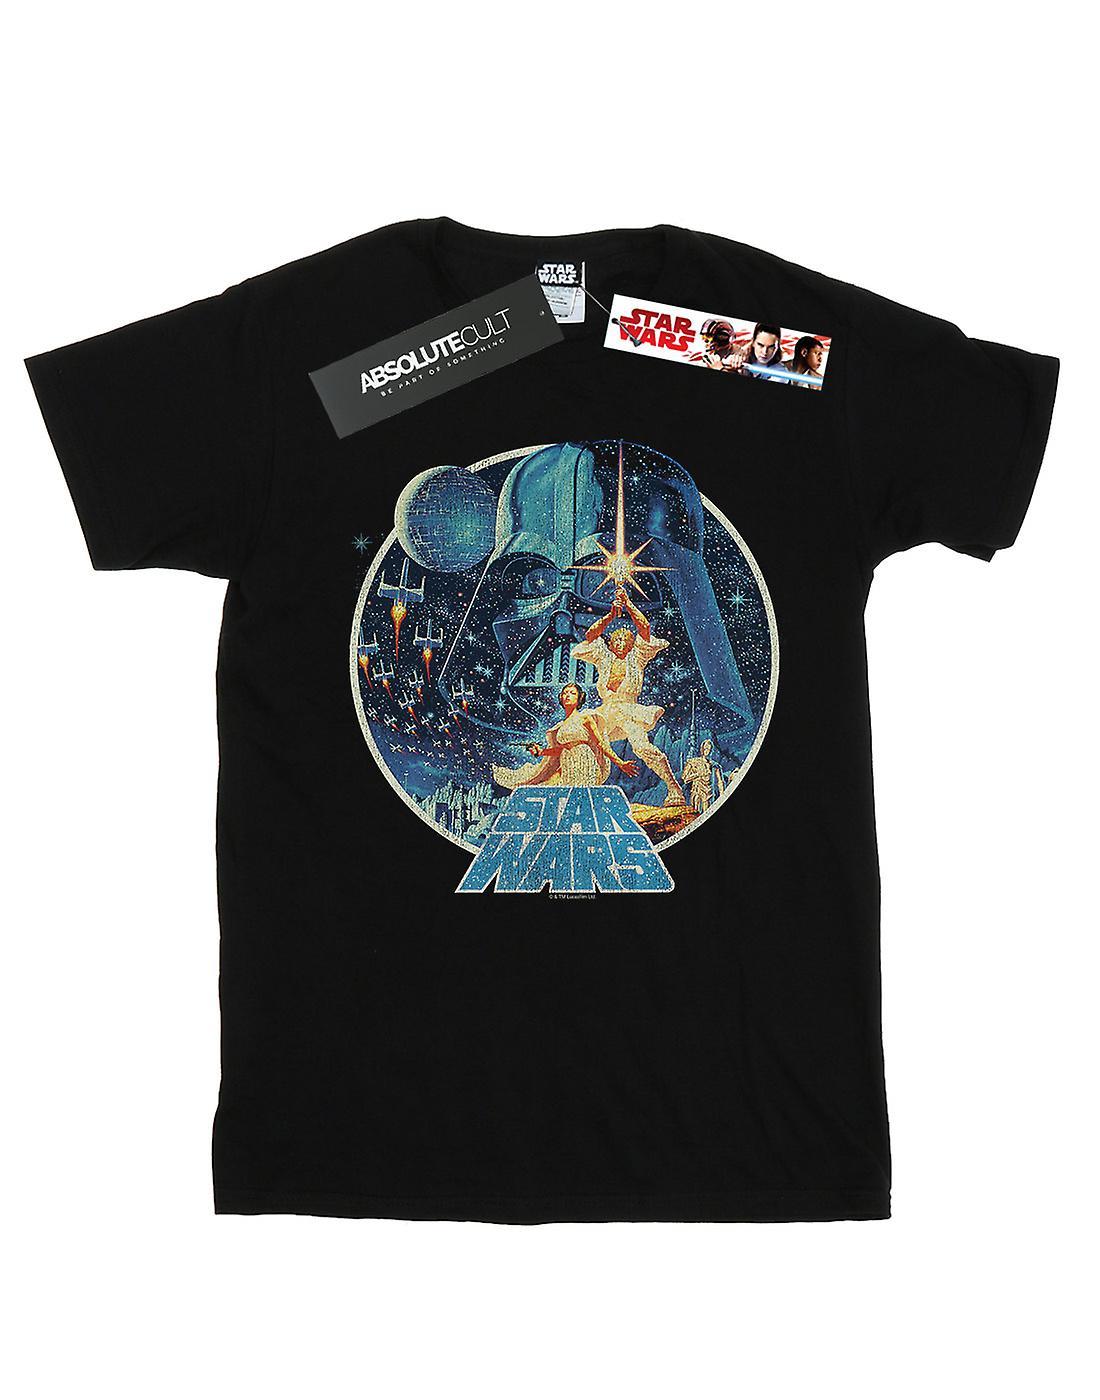 Star Wars Women's Vintage Victory Boyfriend Fit T-Shirt